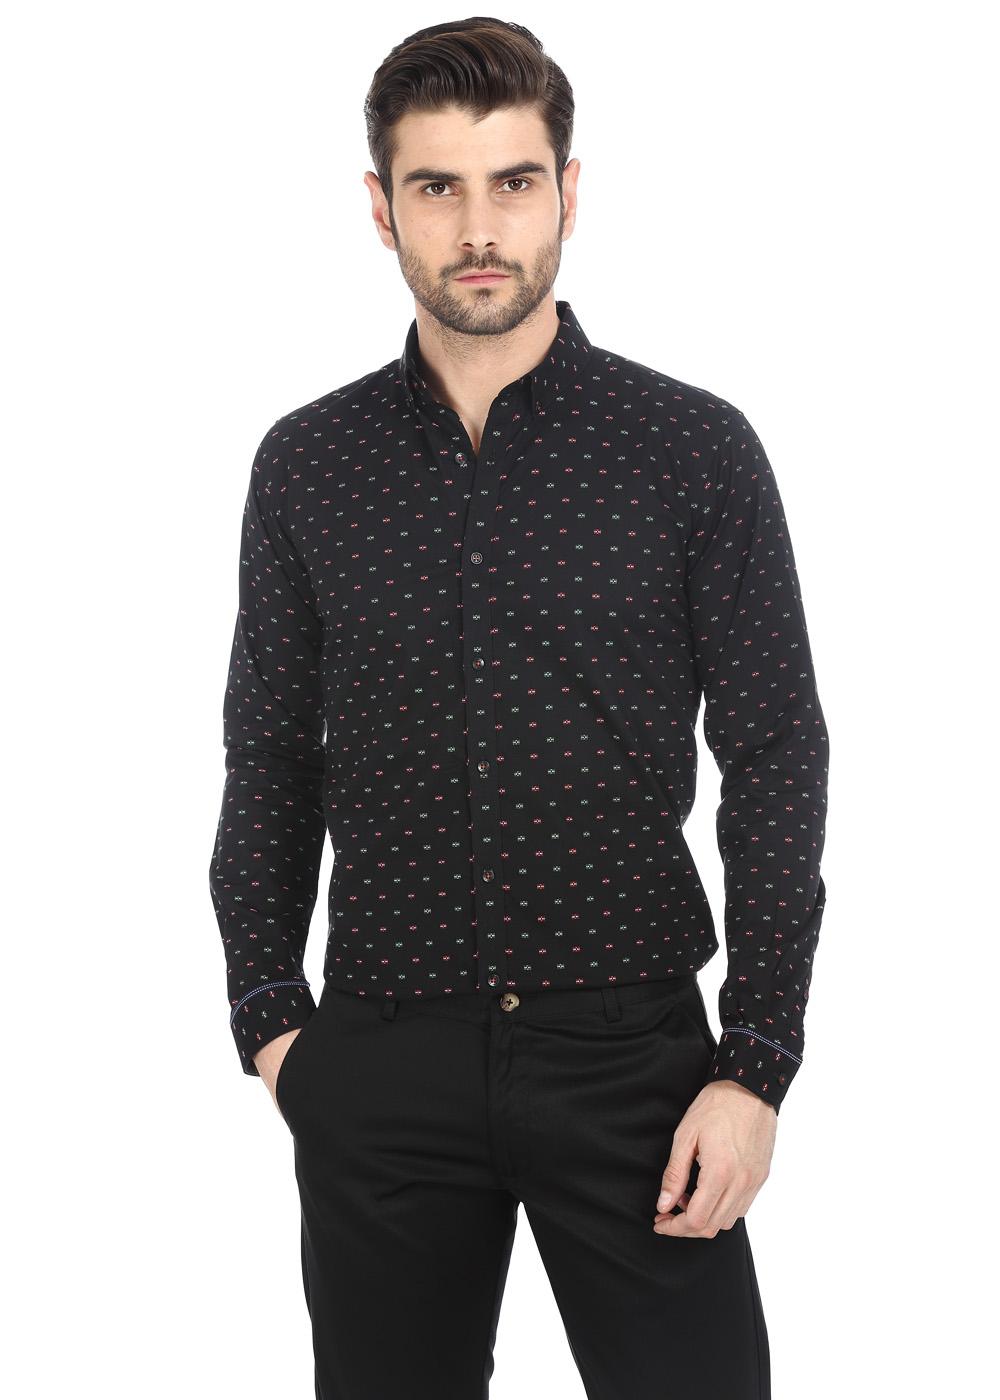 Basics | Basics Smart Slim Fit Anthracite Black Jacquard Butta Evening Wear Shirt